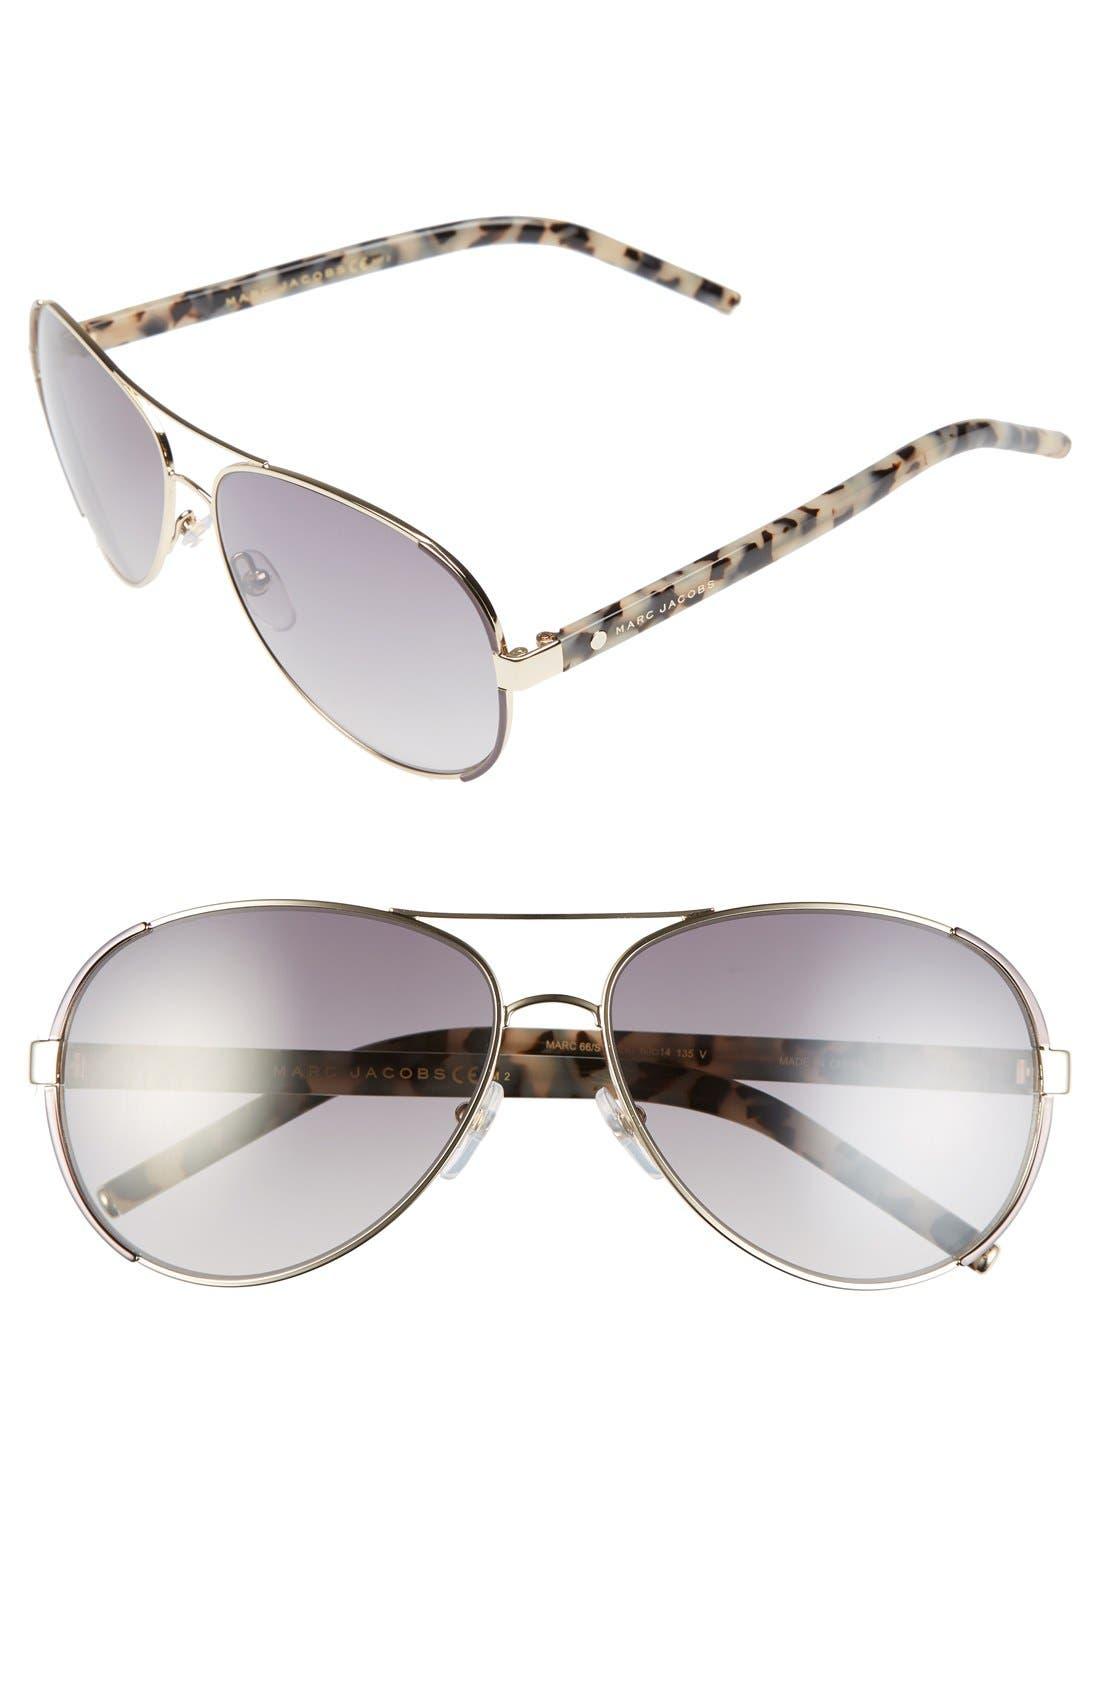 60mm Oversize Aviator Sunglasses,                         Main,                         color, Gold/ Dark Ruthenium